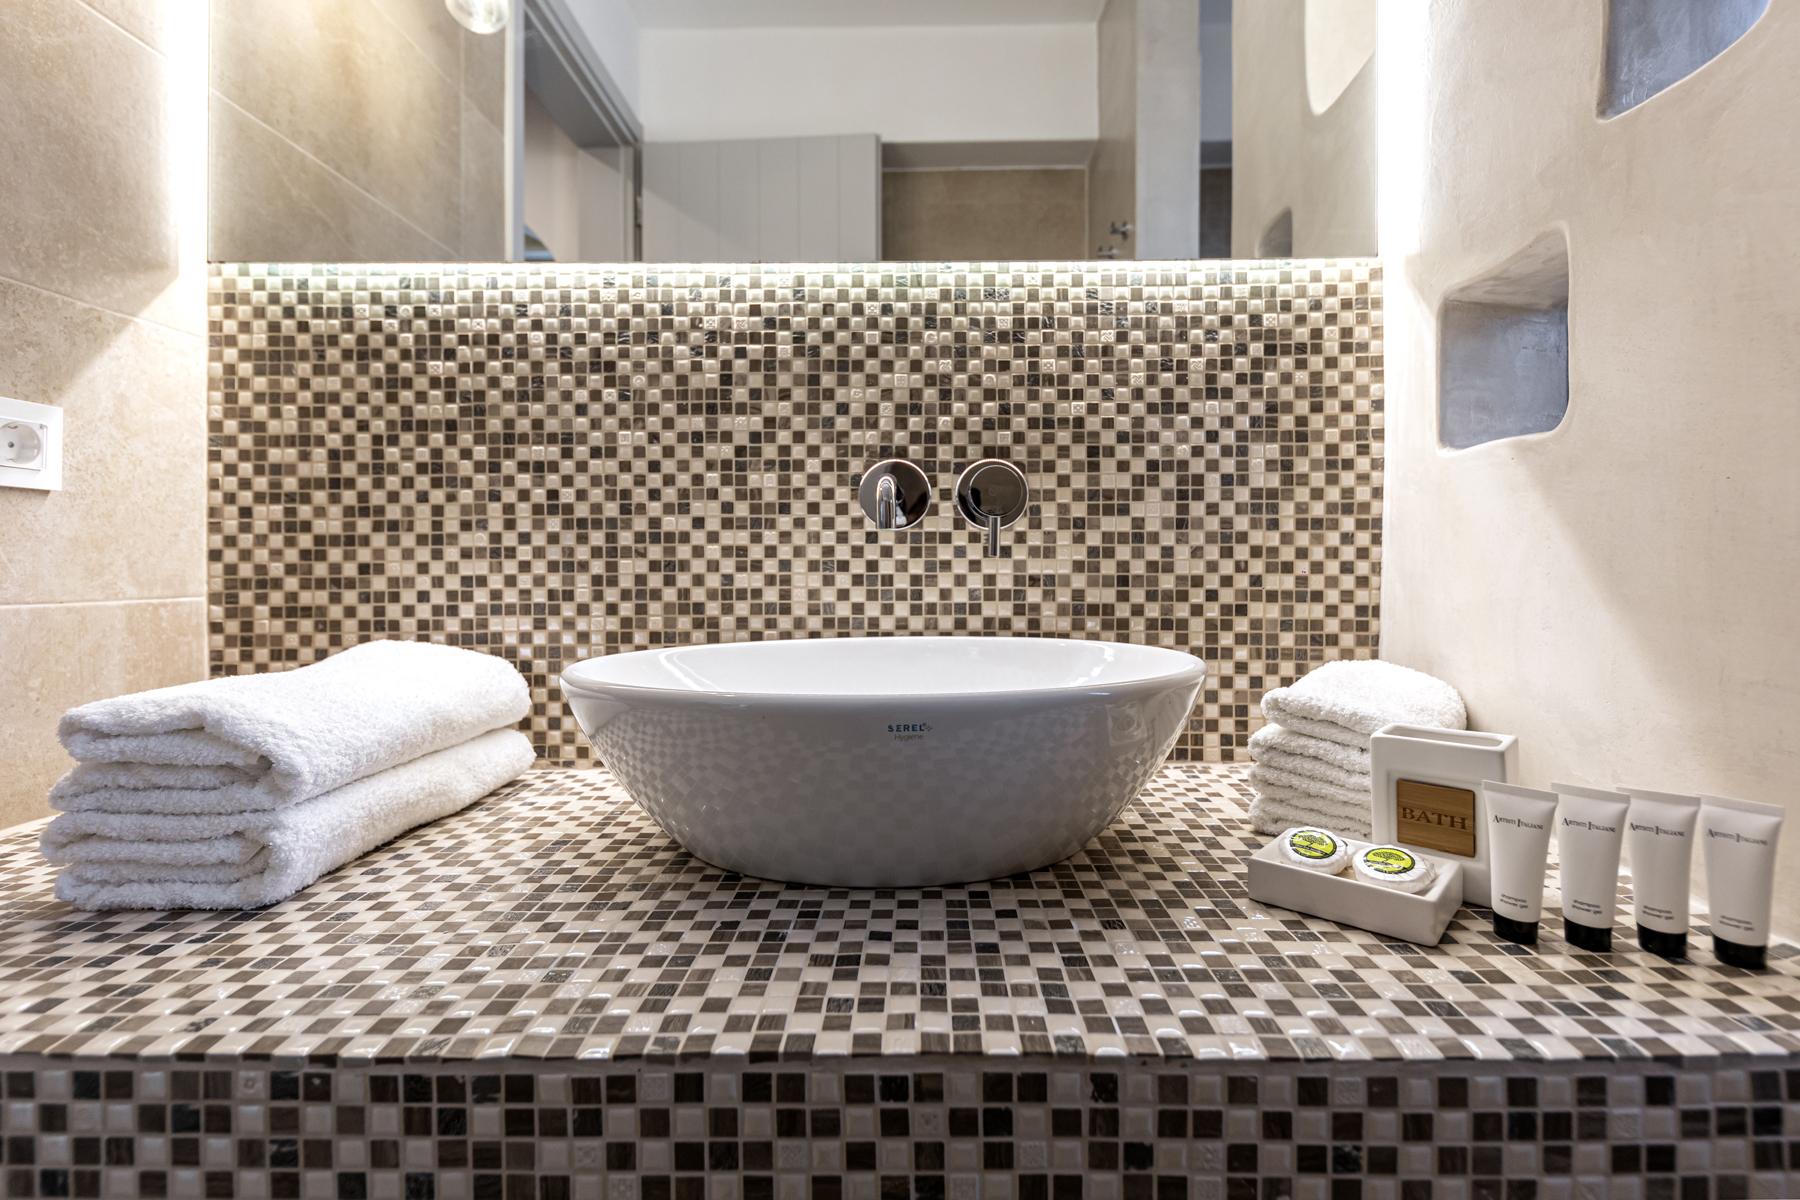 Alafropetra Luxury Suites - Suite 1 - Master bathroom